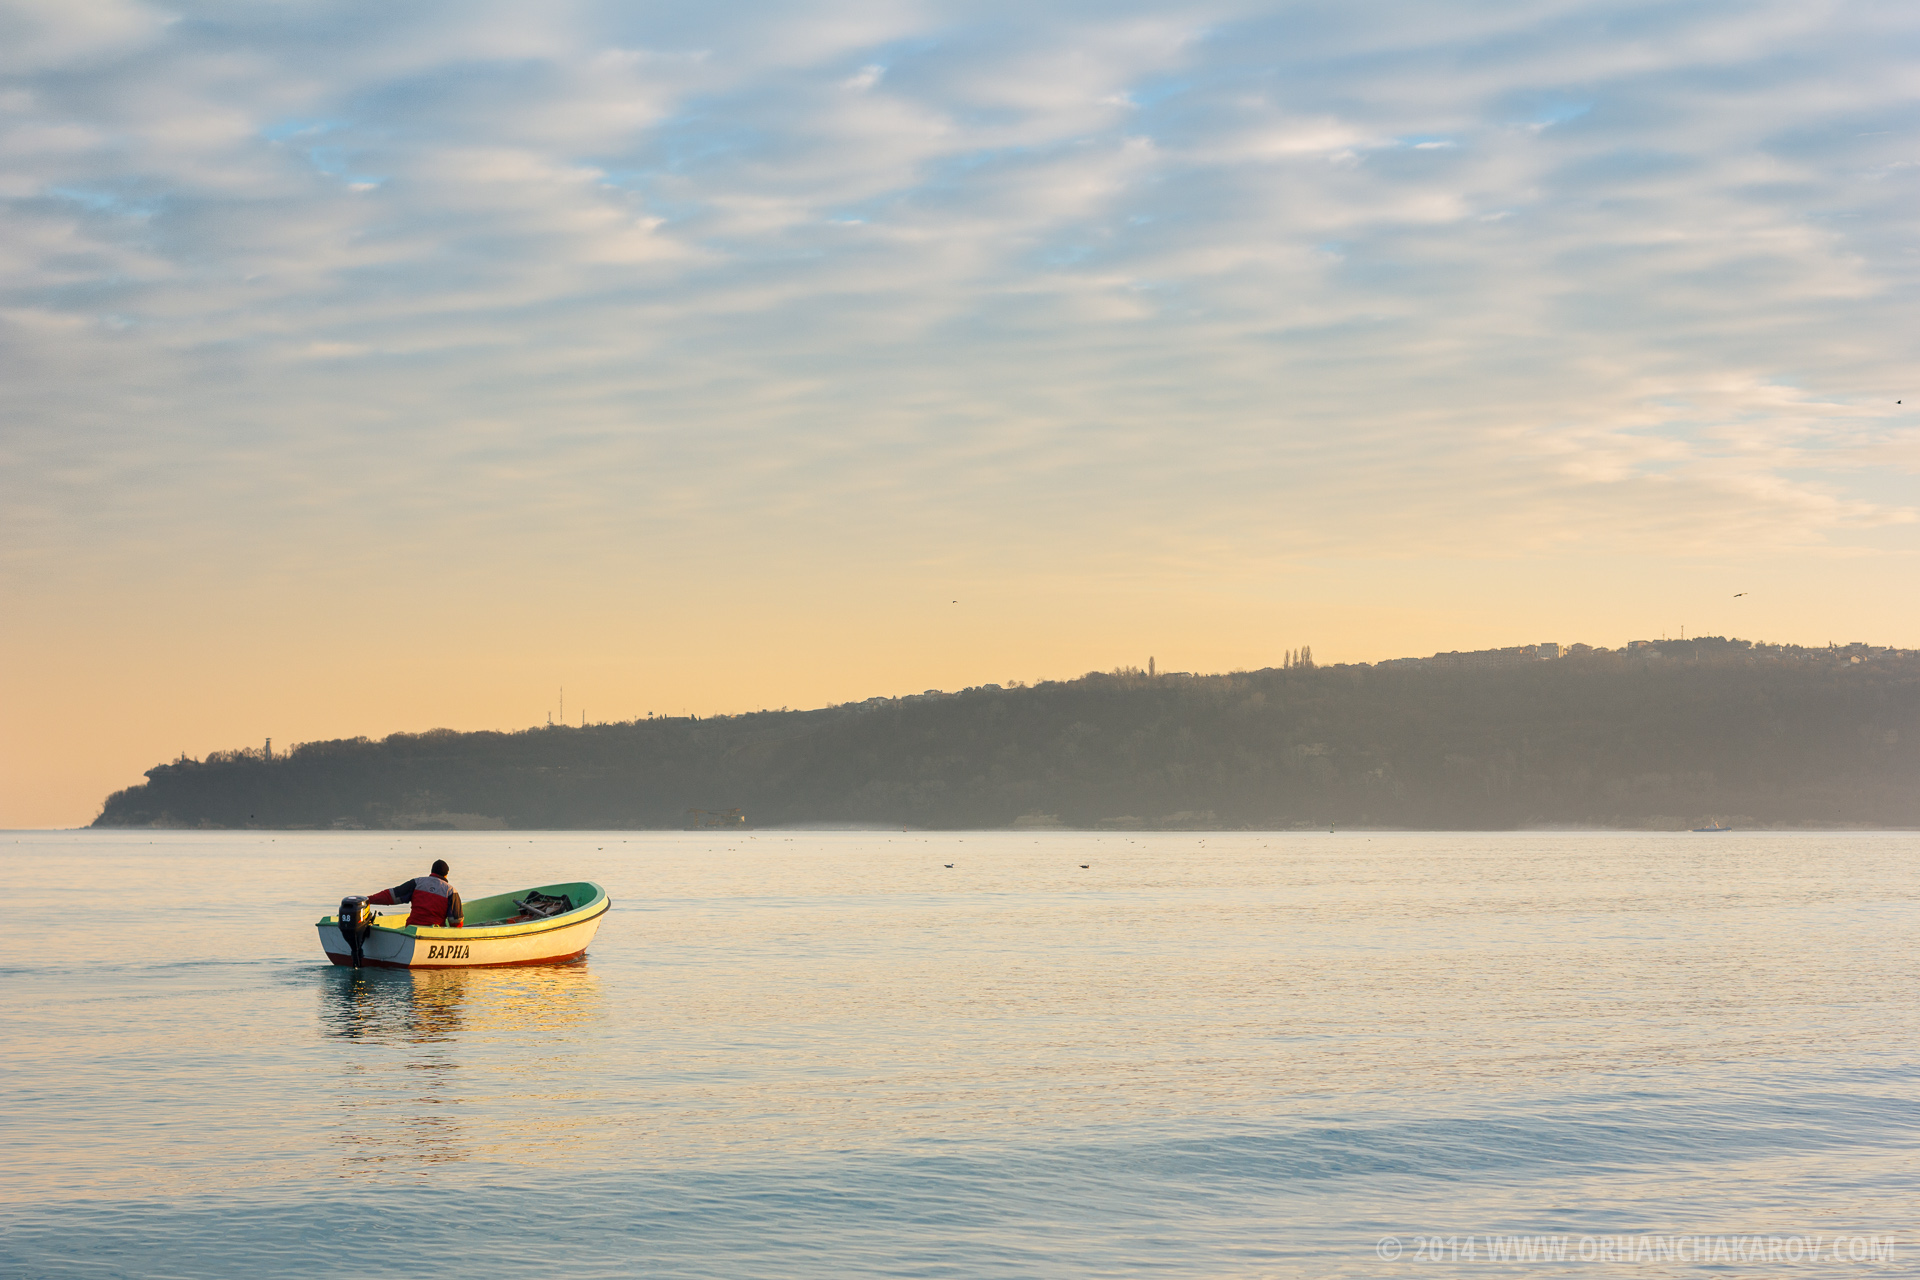 Рибар по залез. Фотограф - Орхан Чакъров, град Варна